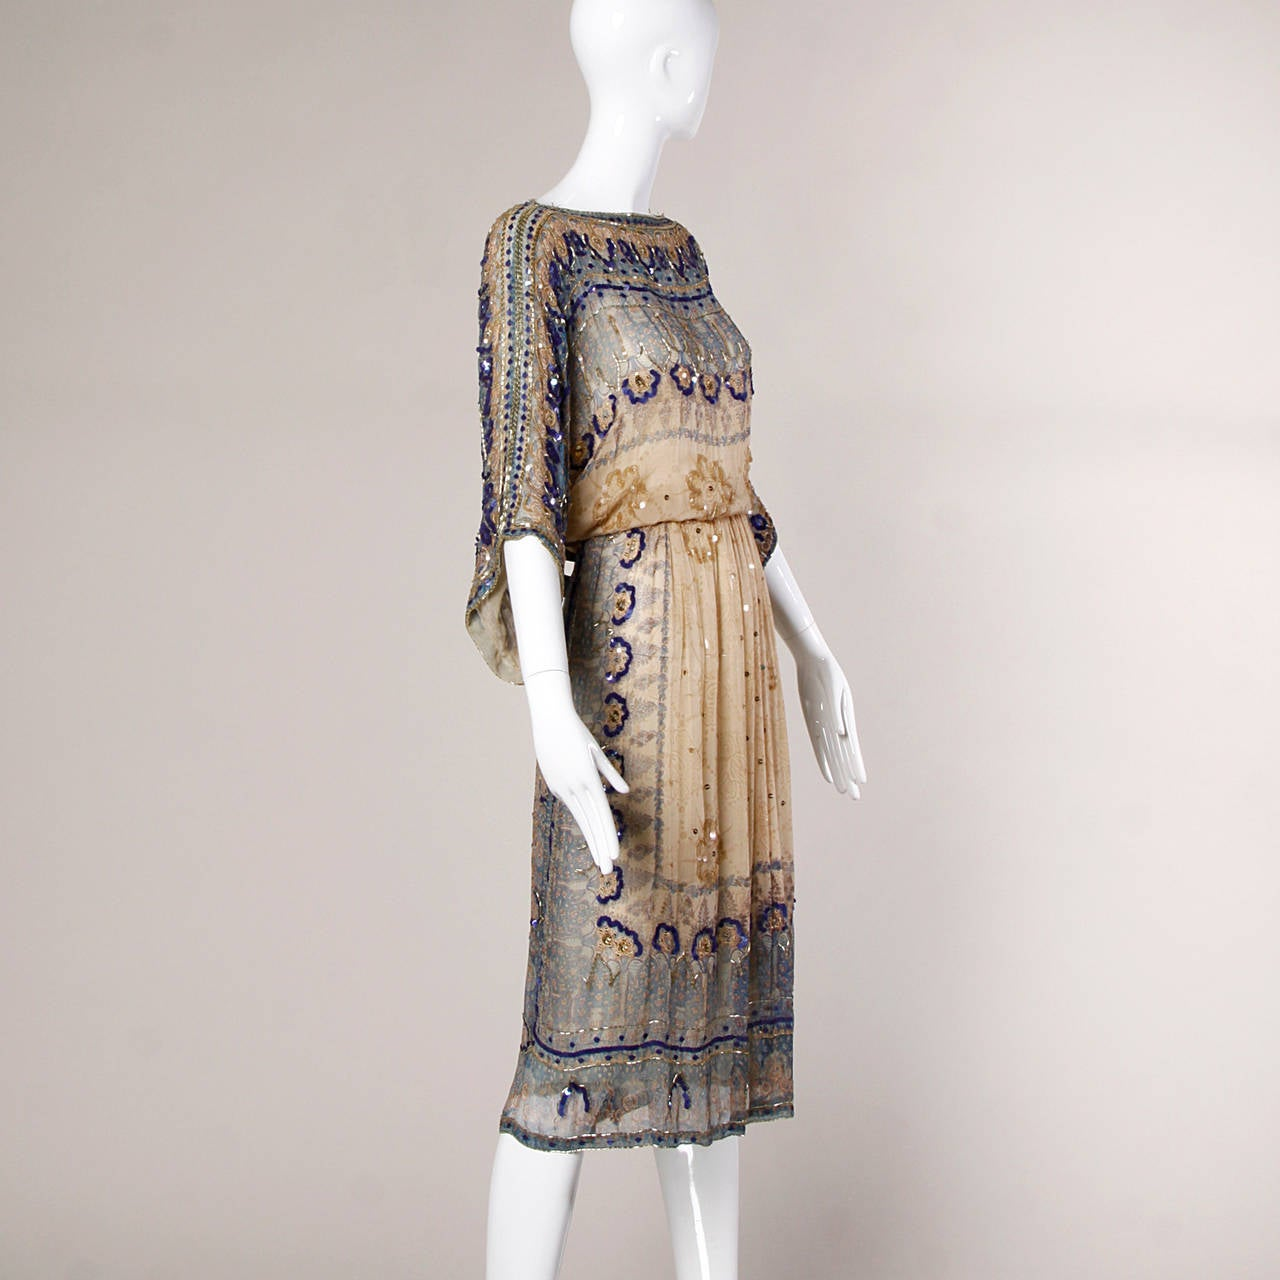 Judith Ann for Bullock's Wilshire Vintage 1970s Silk India Print Dress 2